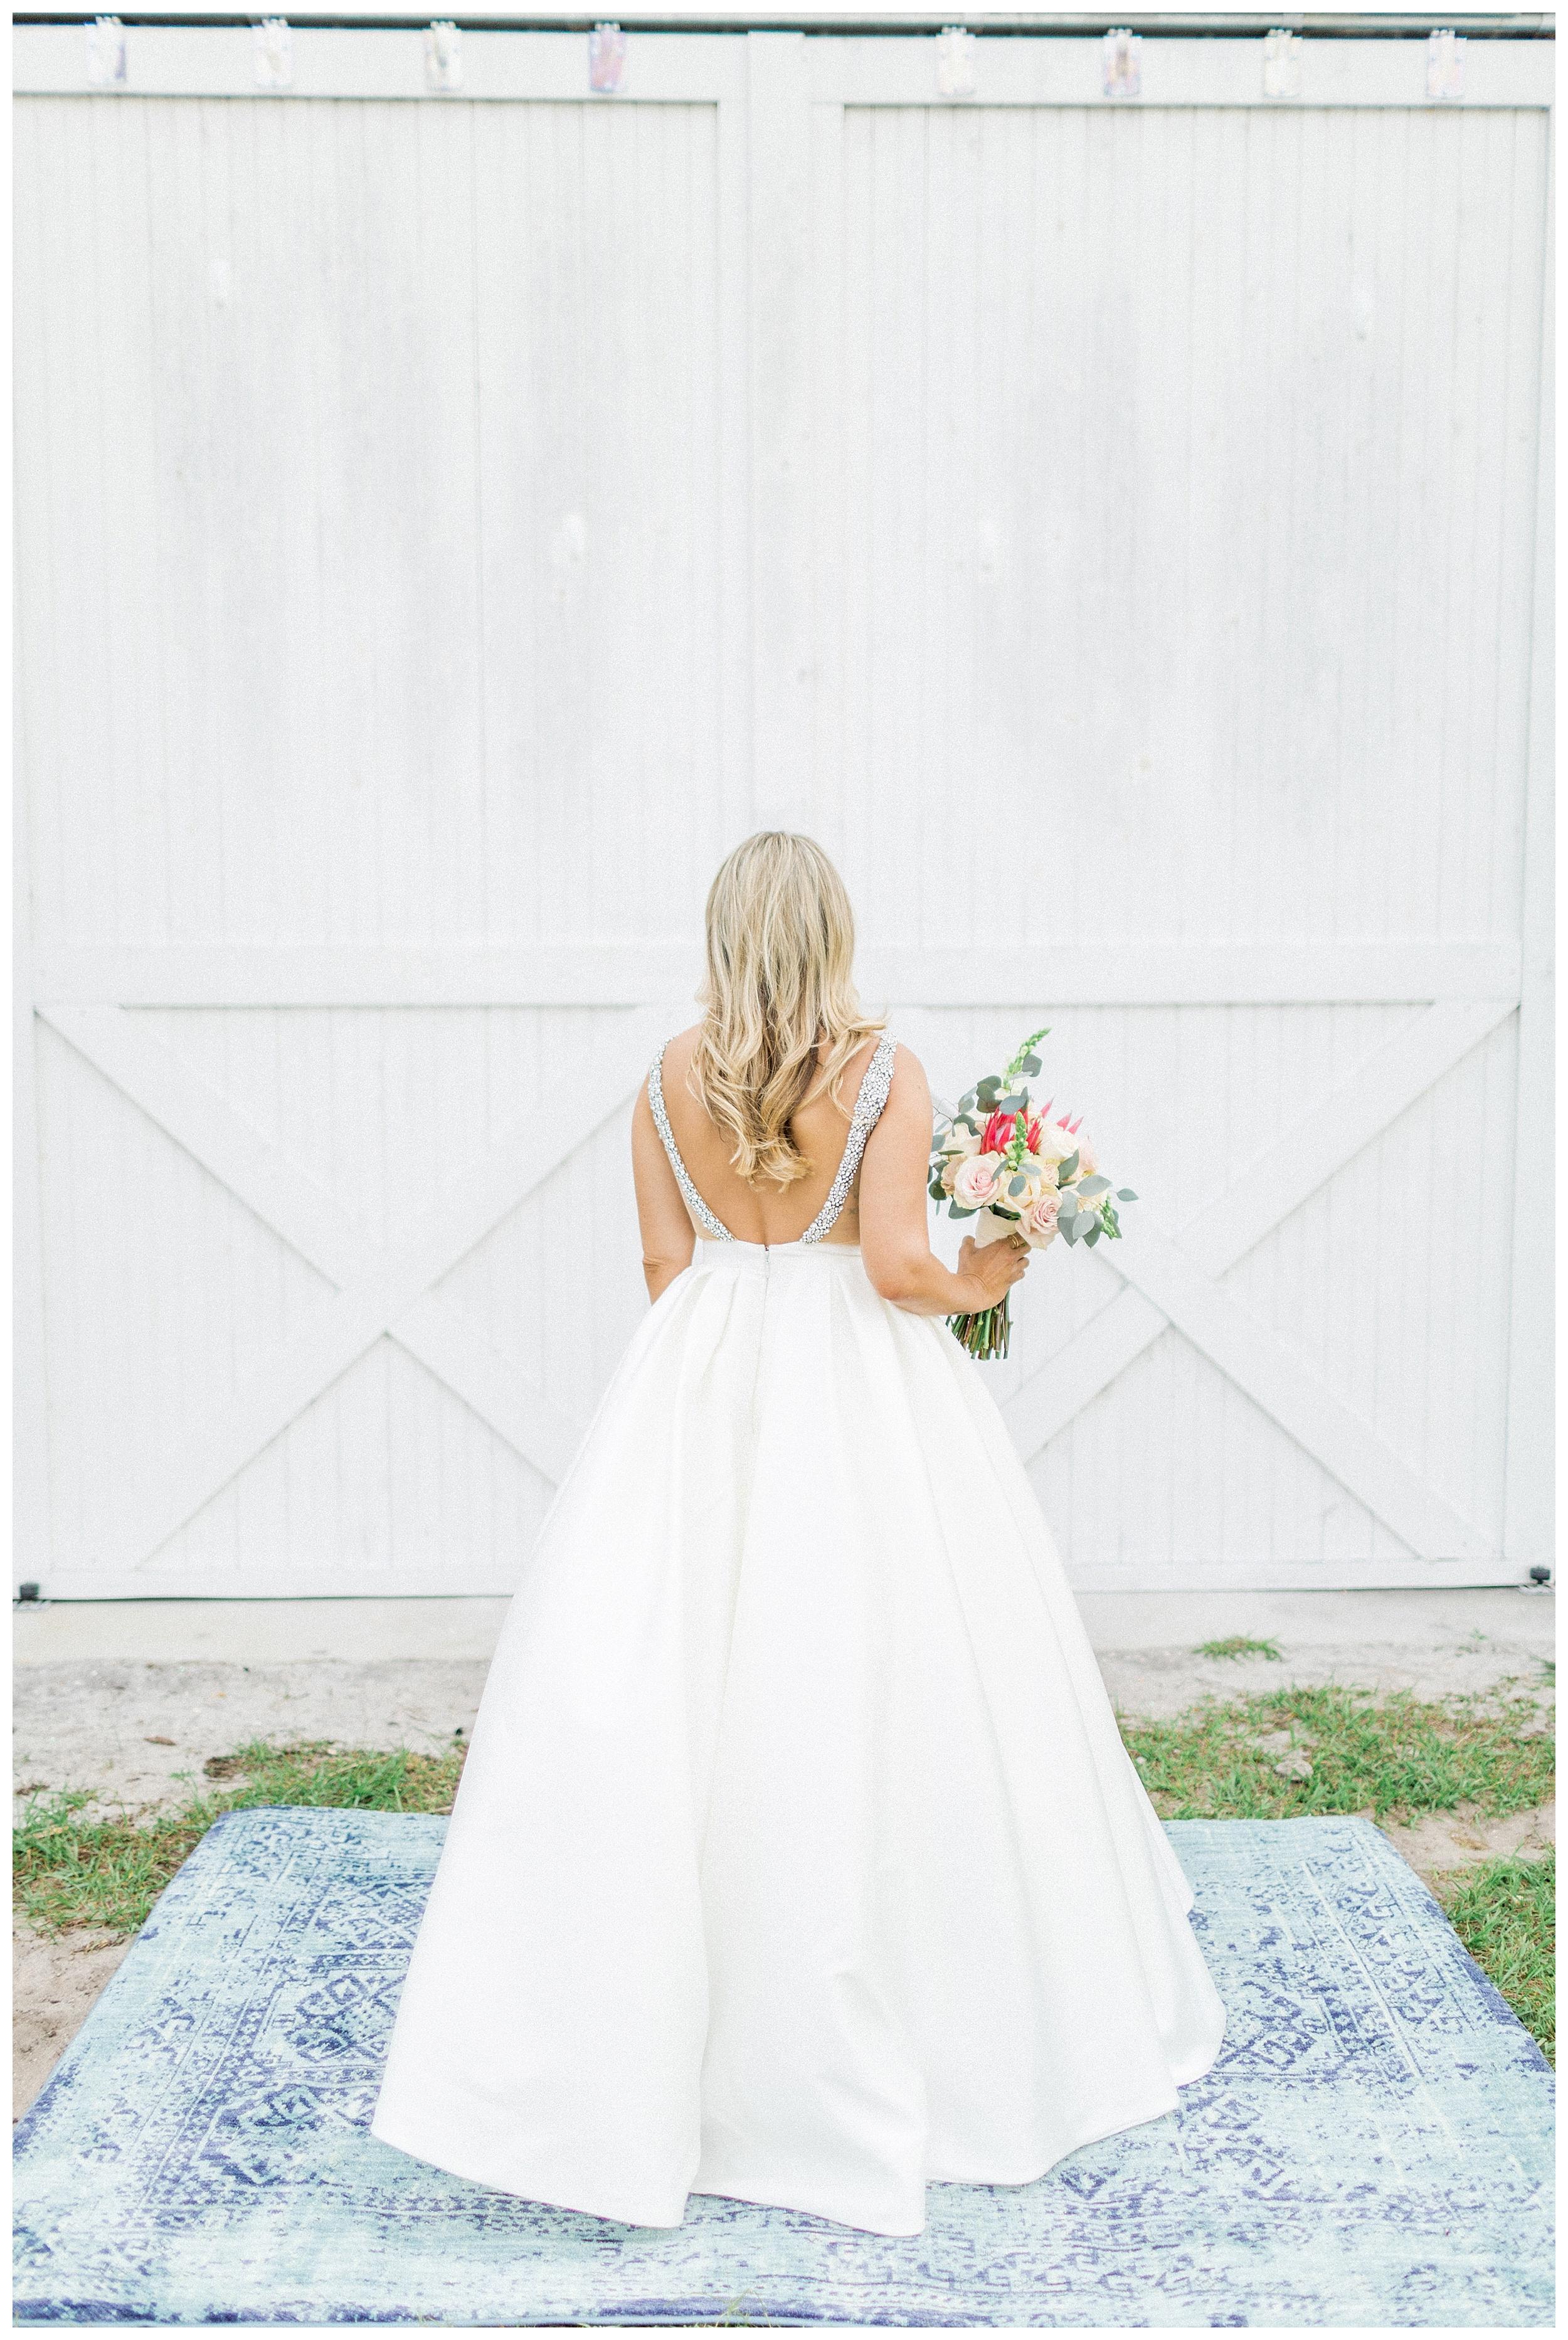 South Florida Wedding Photographer Kir Tuben_0026.jpg